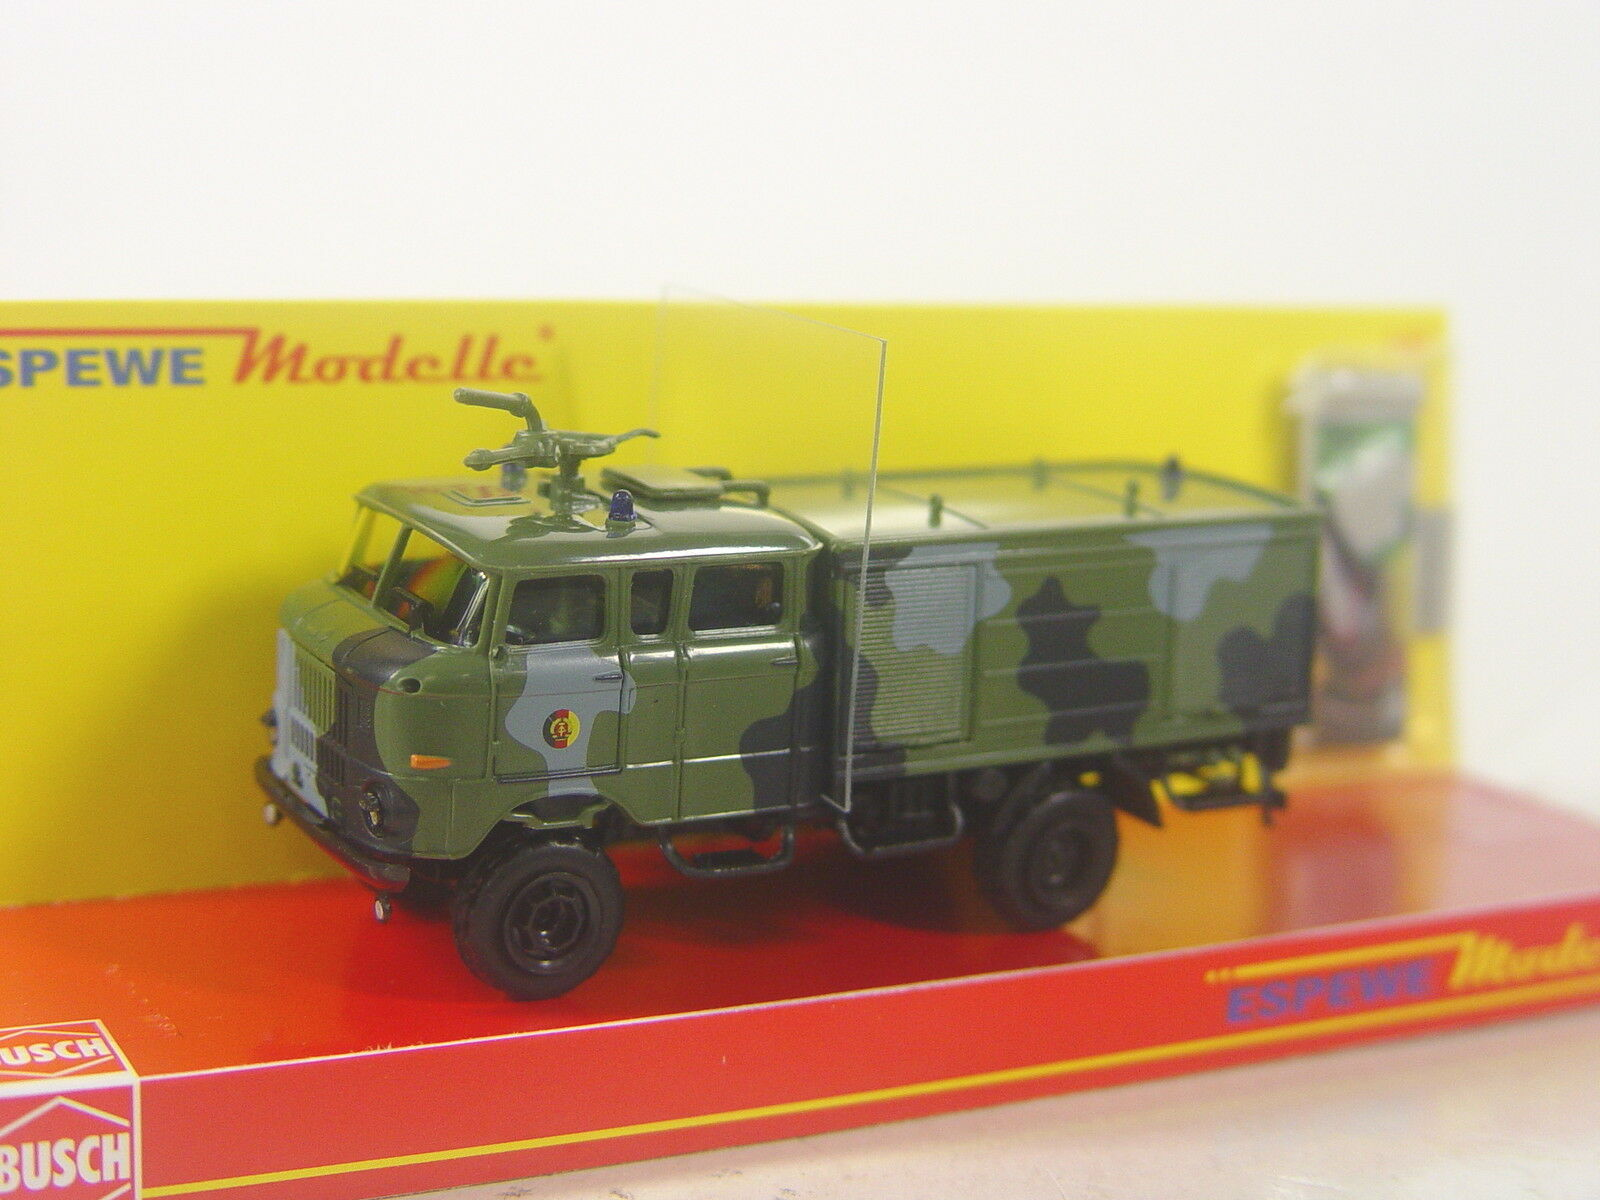 IFA W50 LA TLF Grenze NVA - Busch Espewe Espewe Espewe Modell HO 1 87 -  95219  E    Spielzeugwelt, spielen Sie Ihre eigene Welt  ec909e